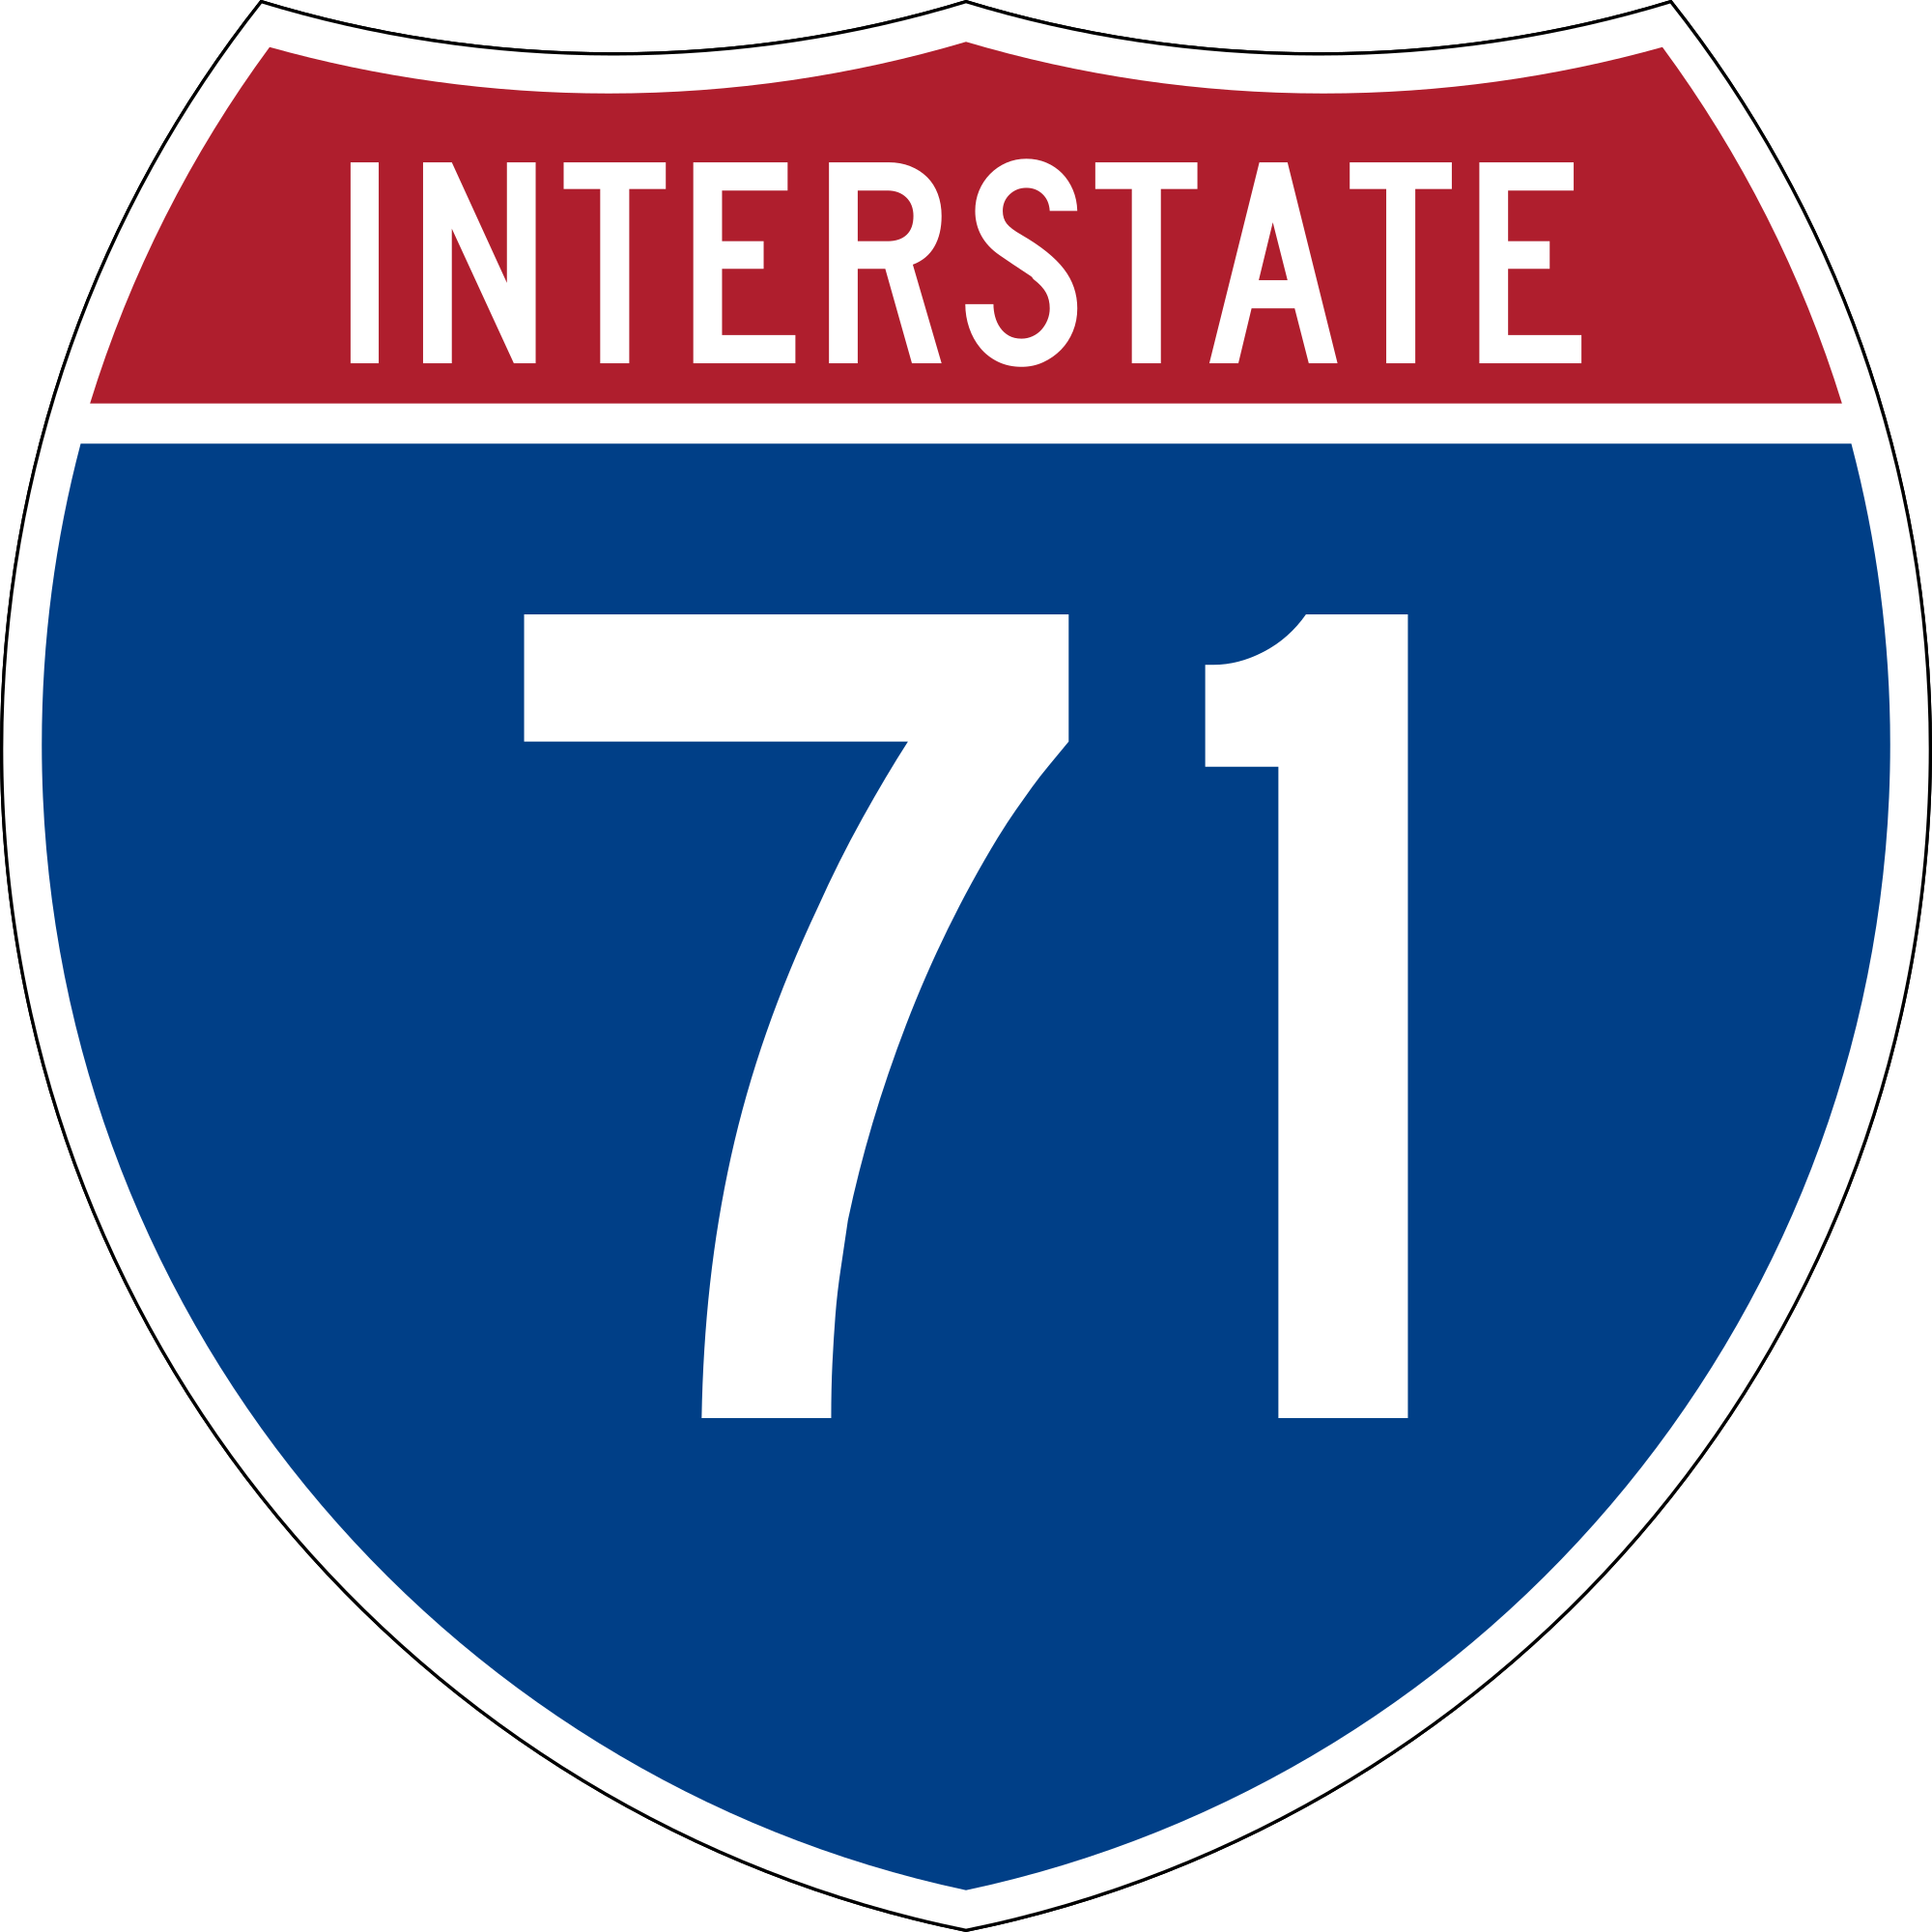 I-71 Road Sign